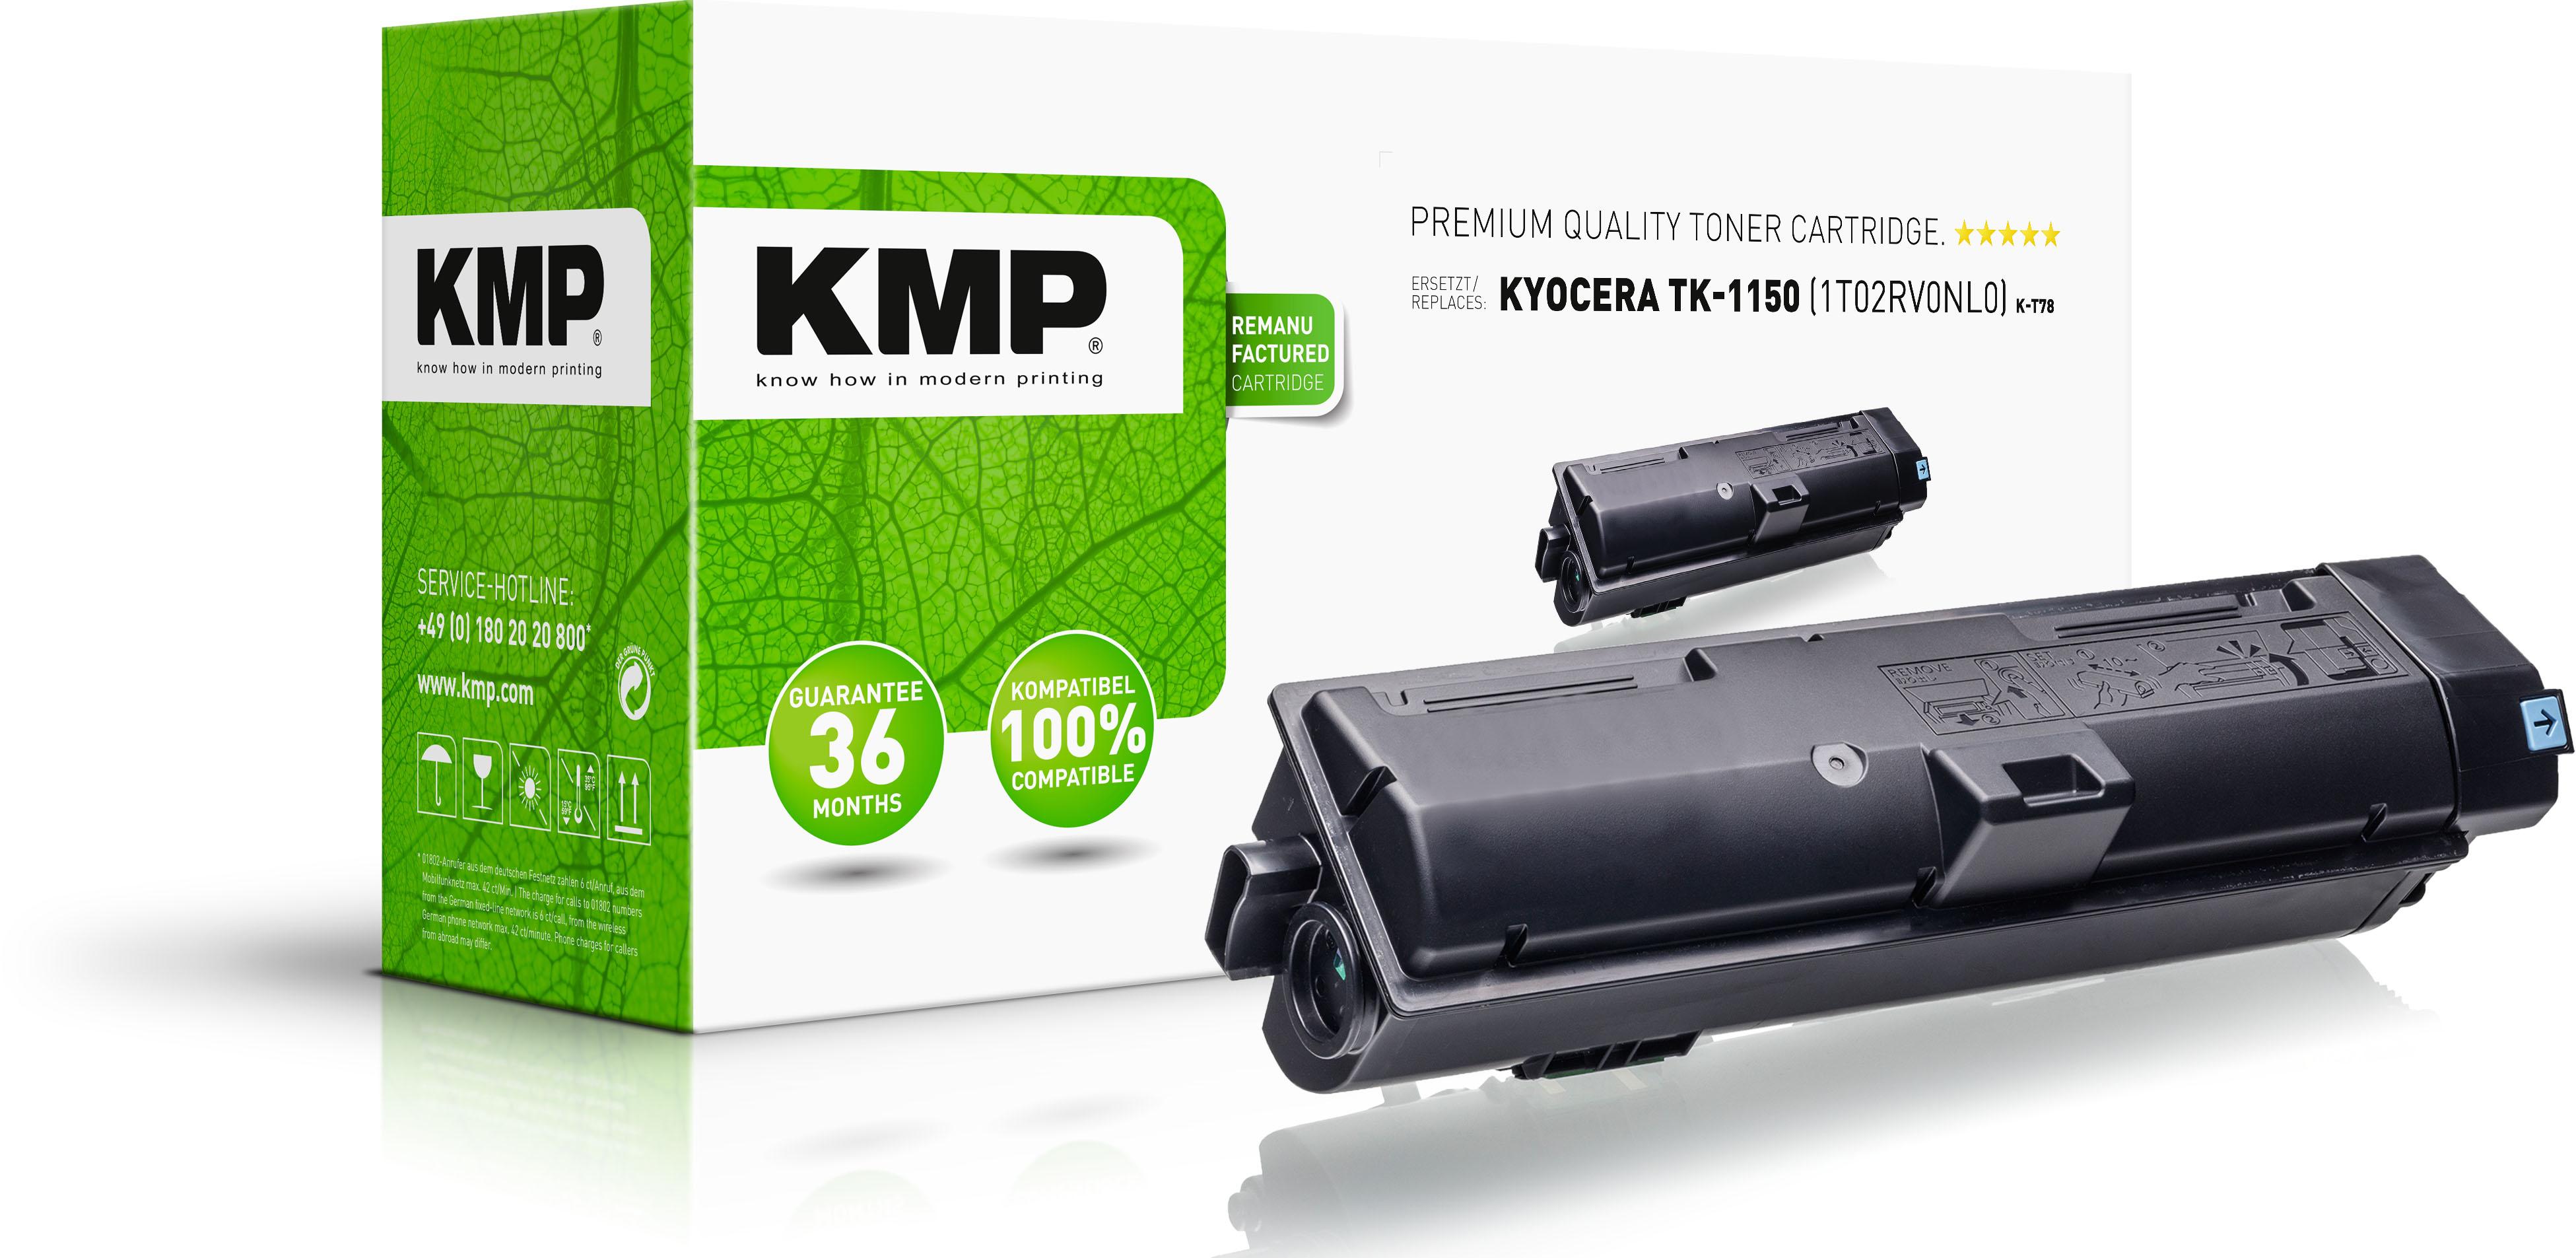 Tonerkartusche ersetzt Kyocera TK1150 (1T02RV0NL0)